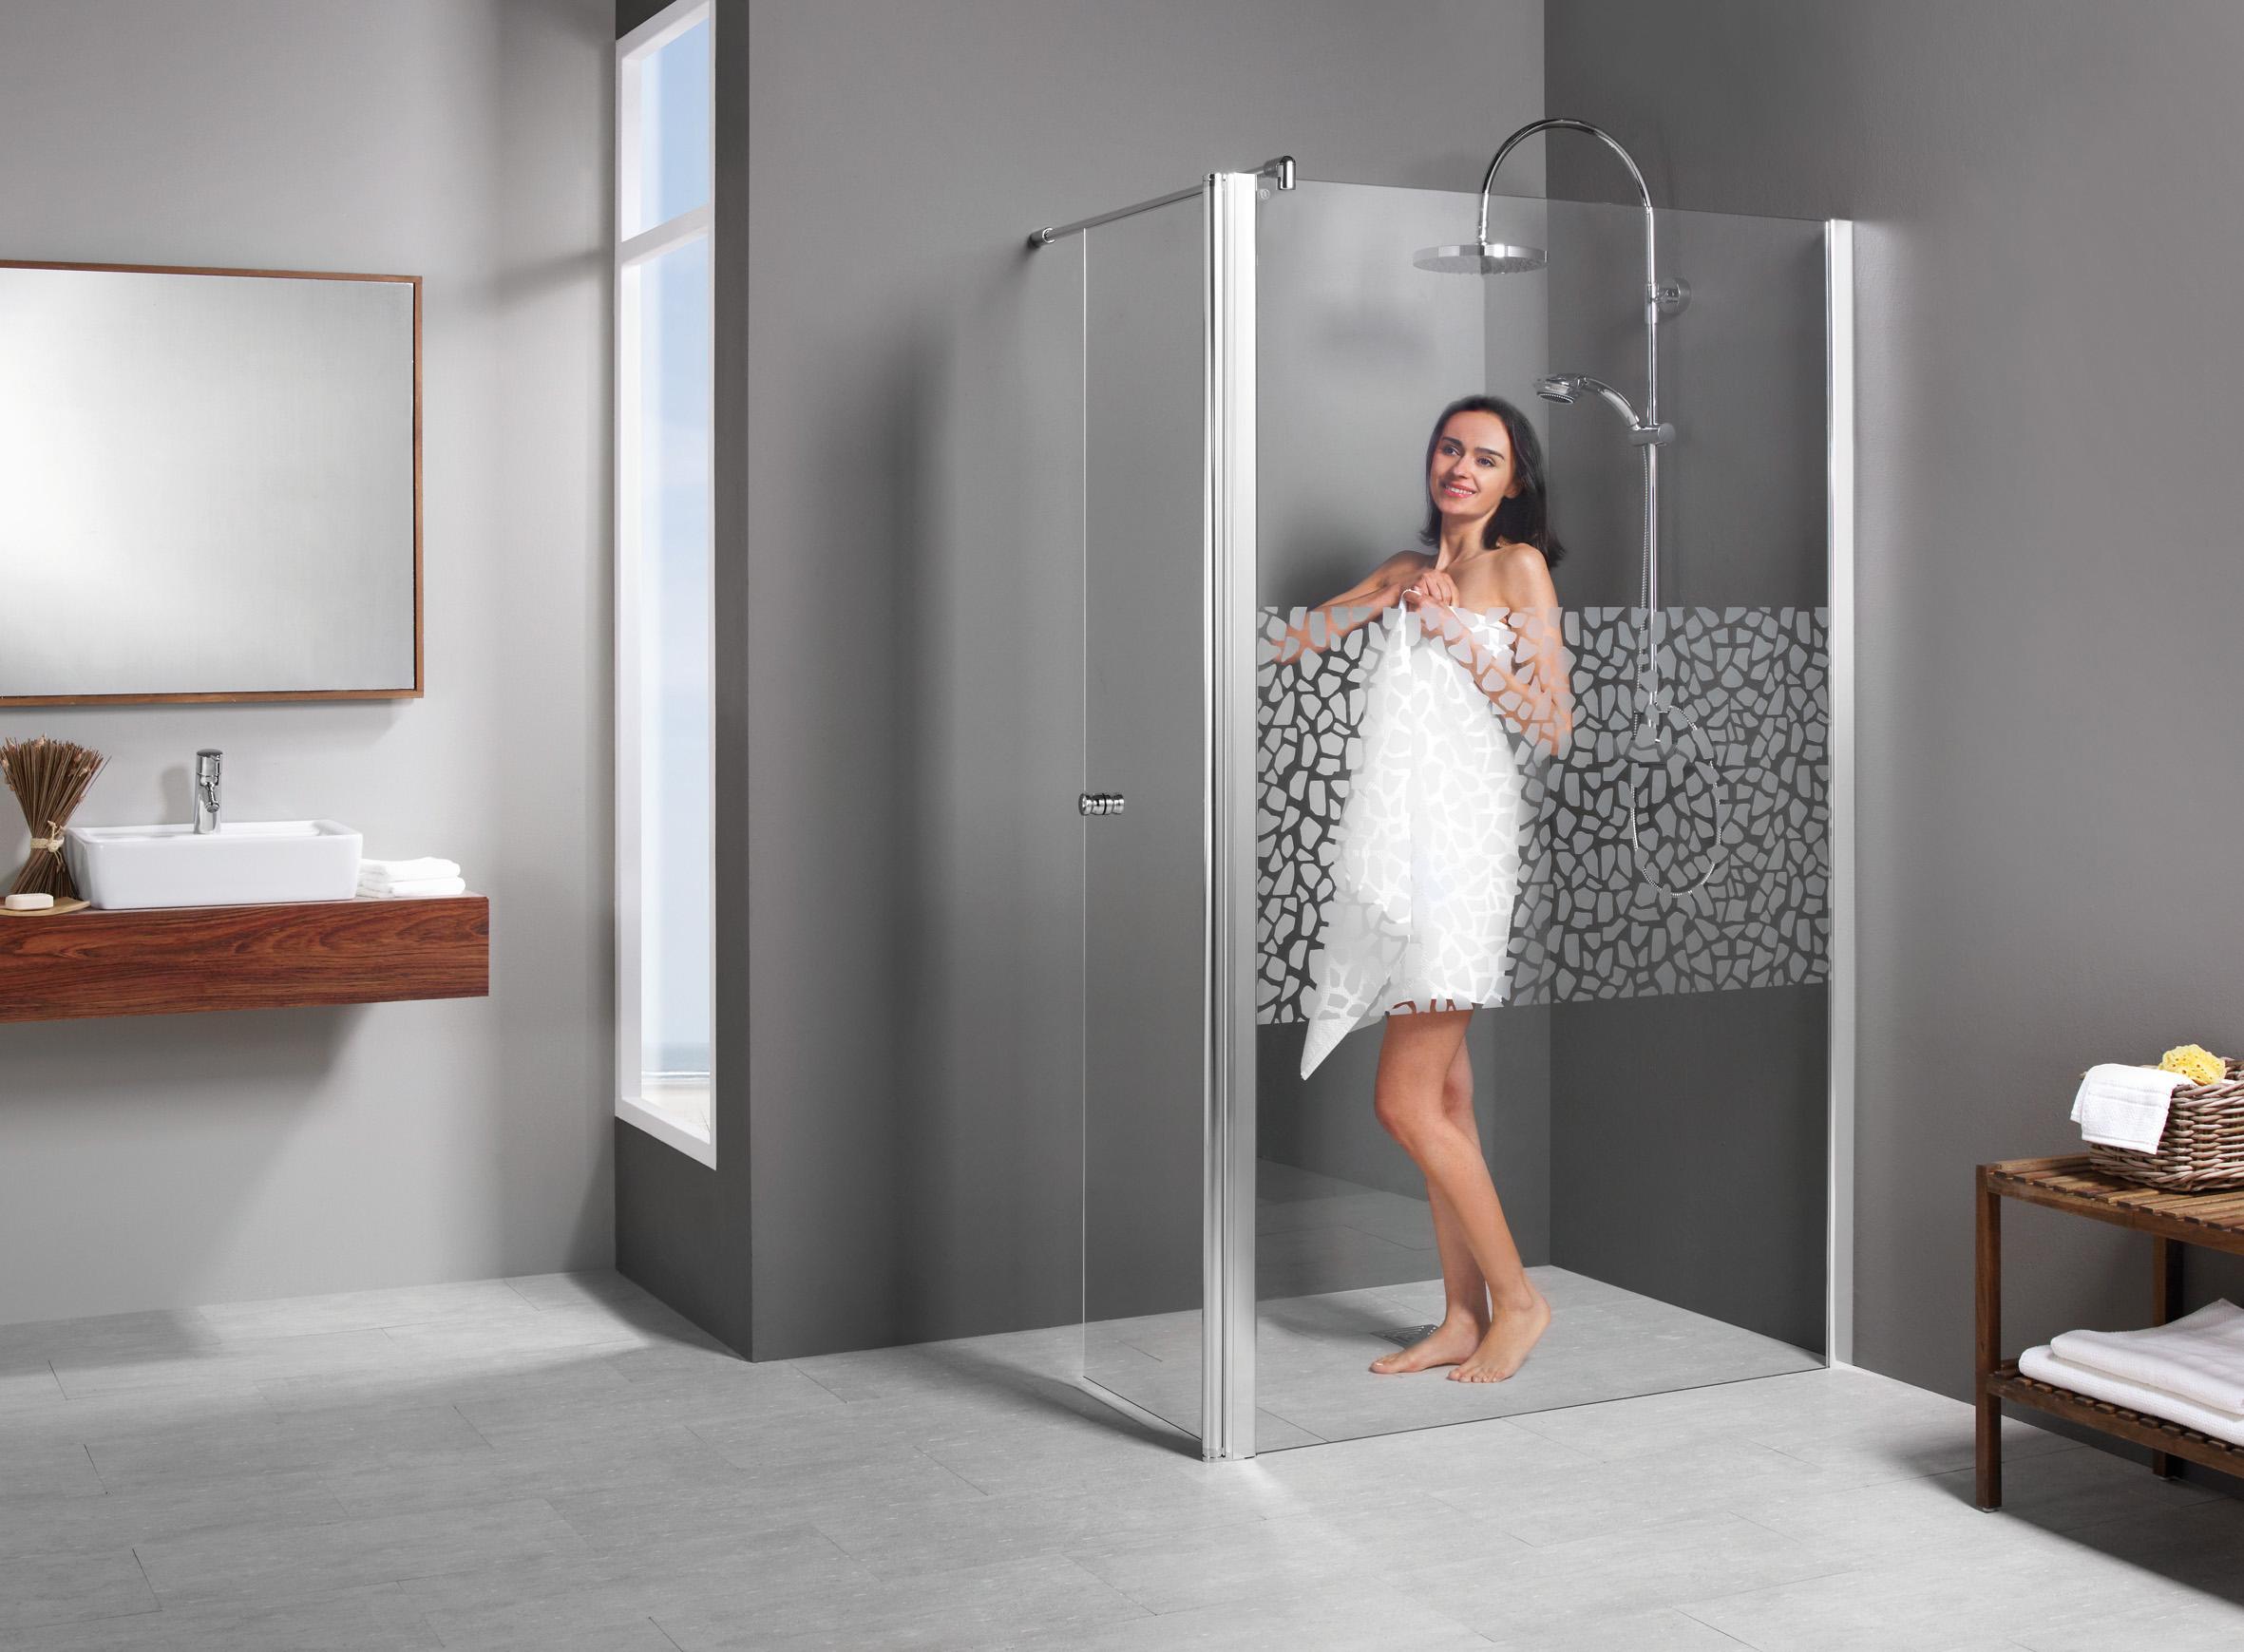 duschkabine dusche entra walk in duschwand bewegl blende. Black Bedroom Furniture Sets. Home Design Ideas